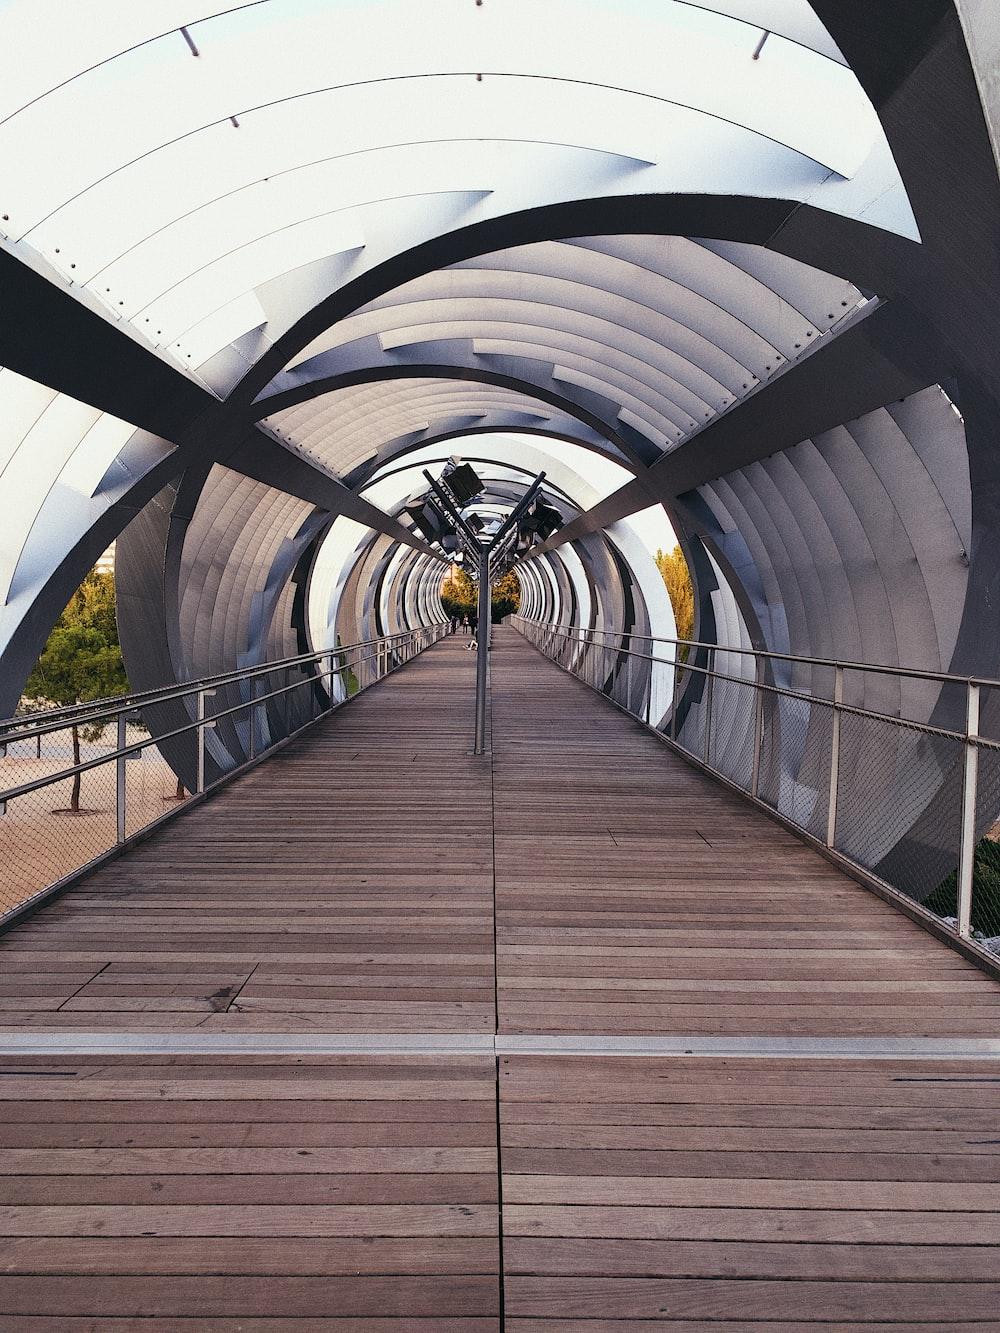 empty walkway during daytime